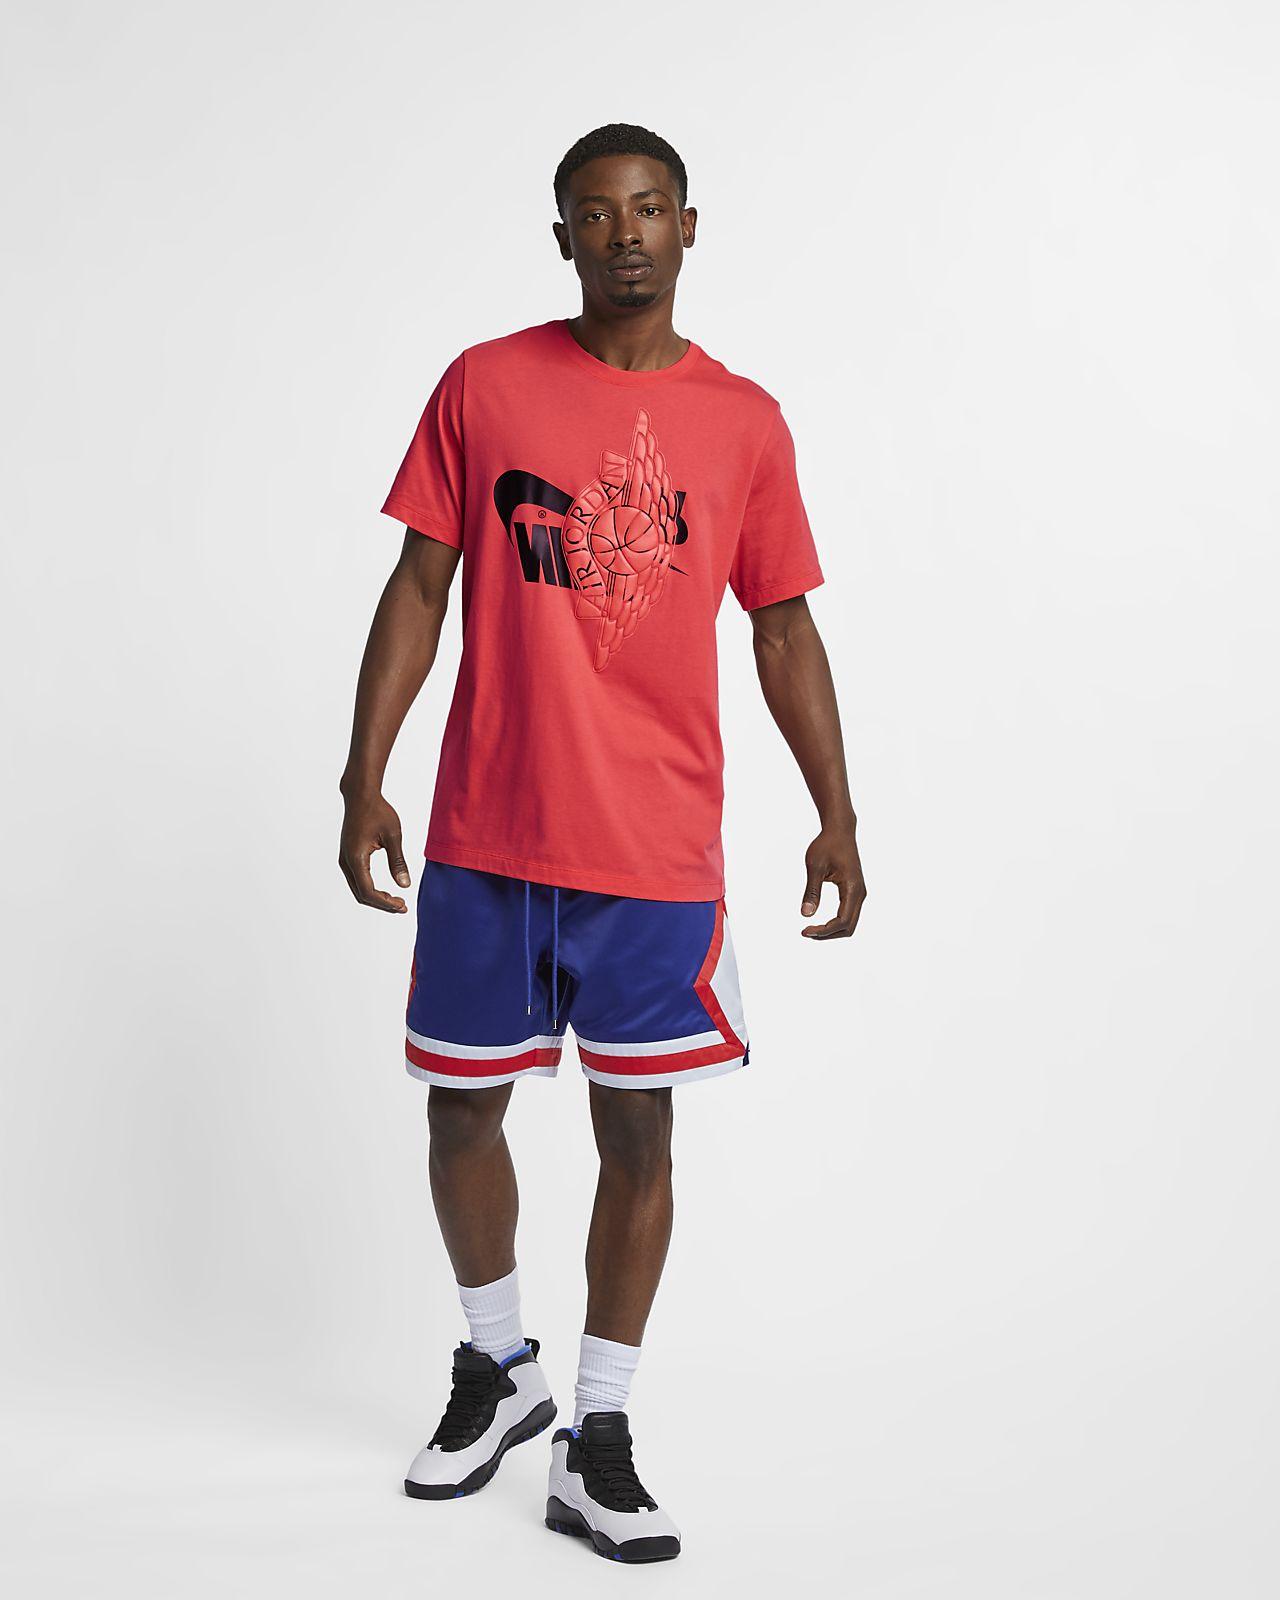 best website 11f57 65a3f ... Jordan Futura Wings Men s T-Shirt